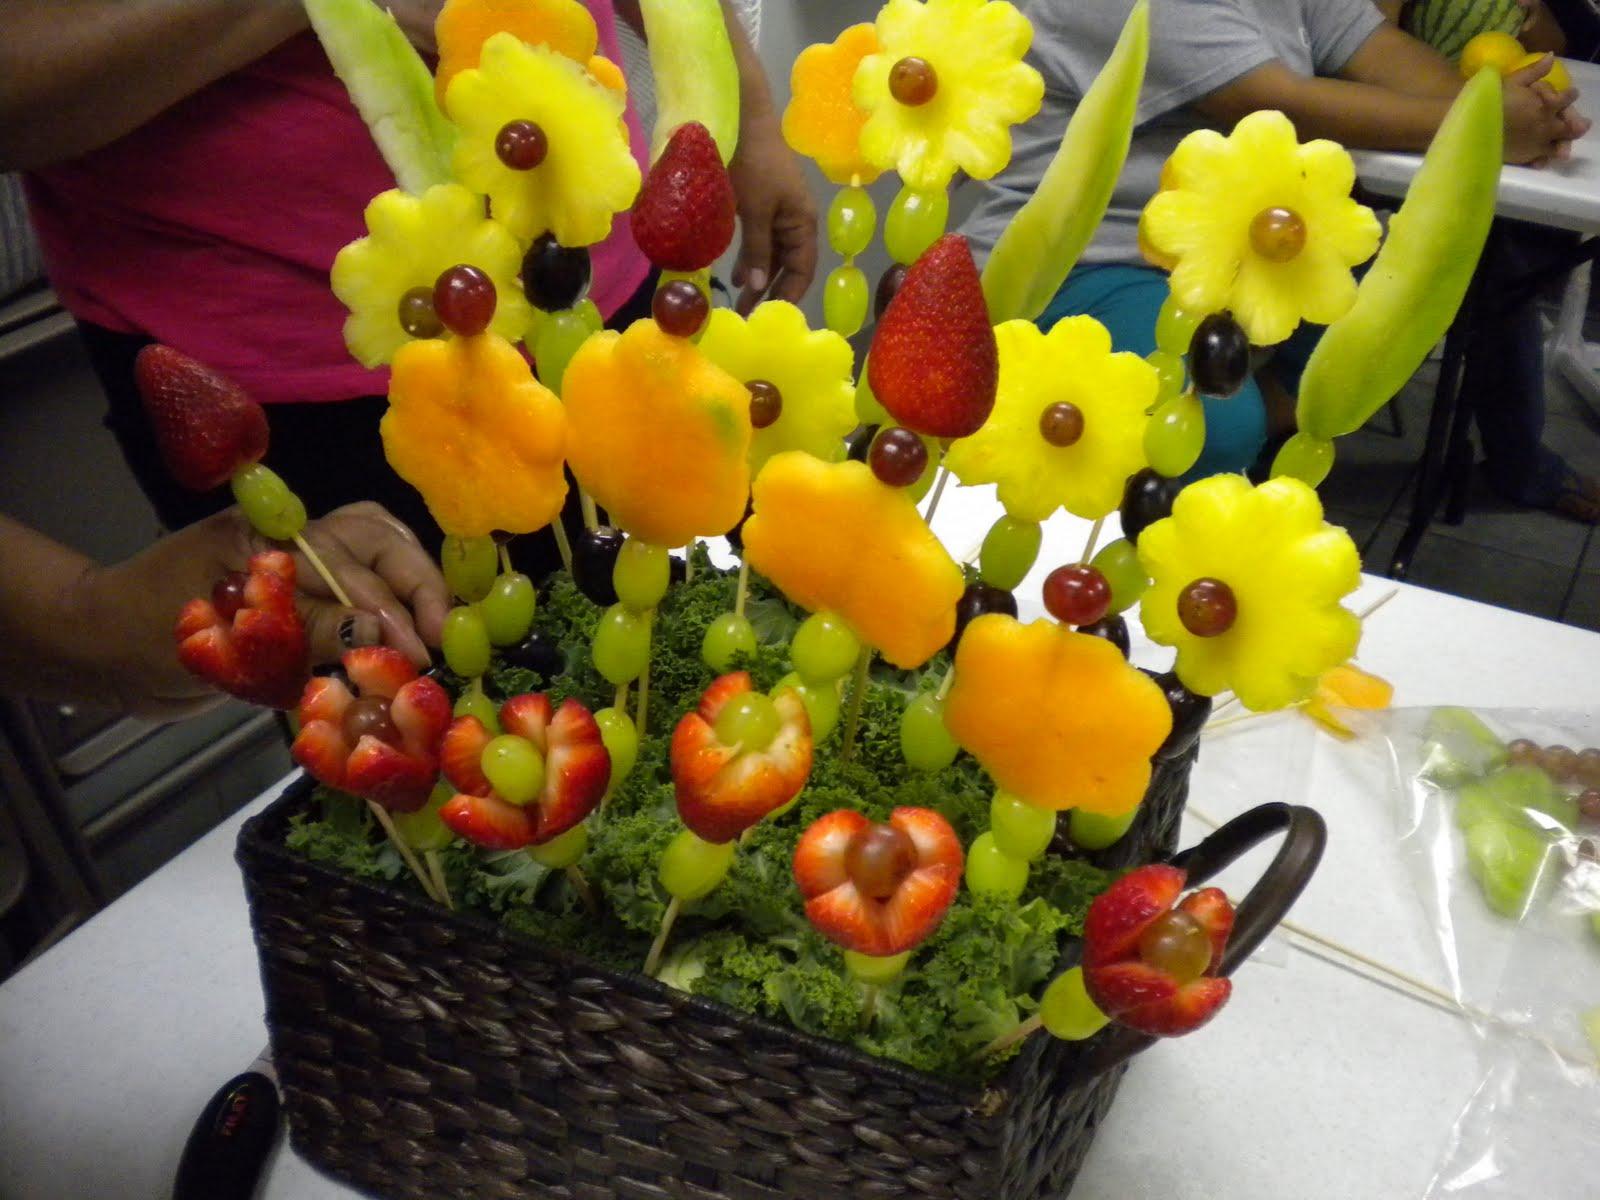 Top como hacer un arreglo de frutas images for pinterest for Centros de mesa con frutas